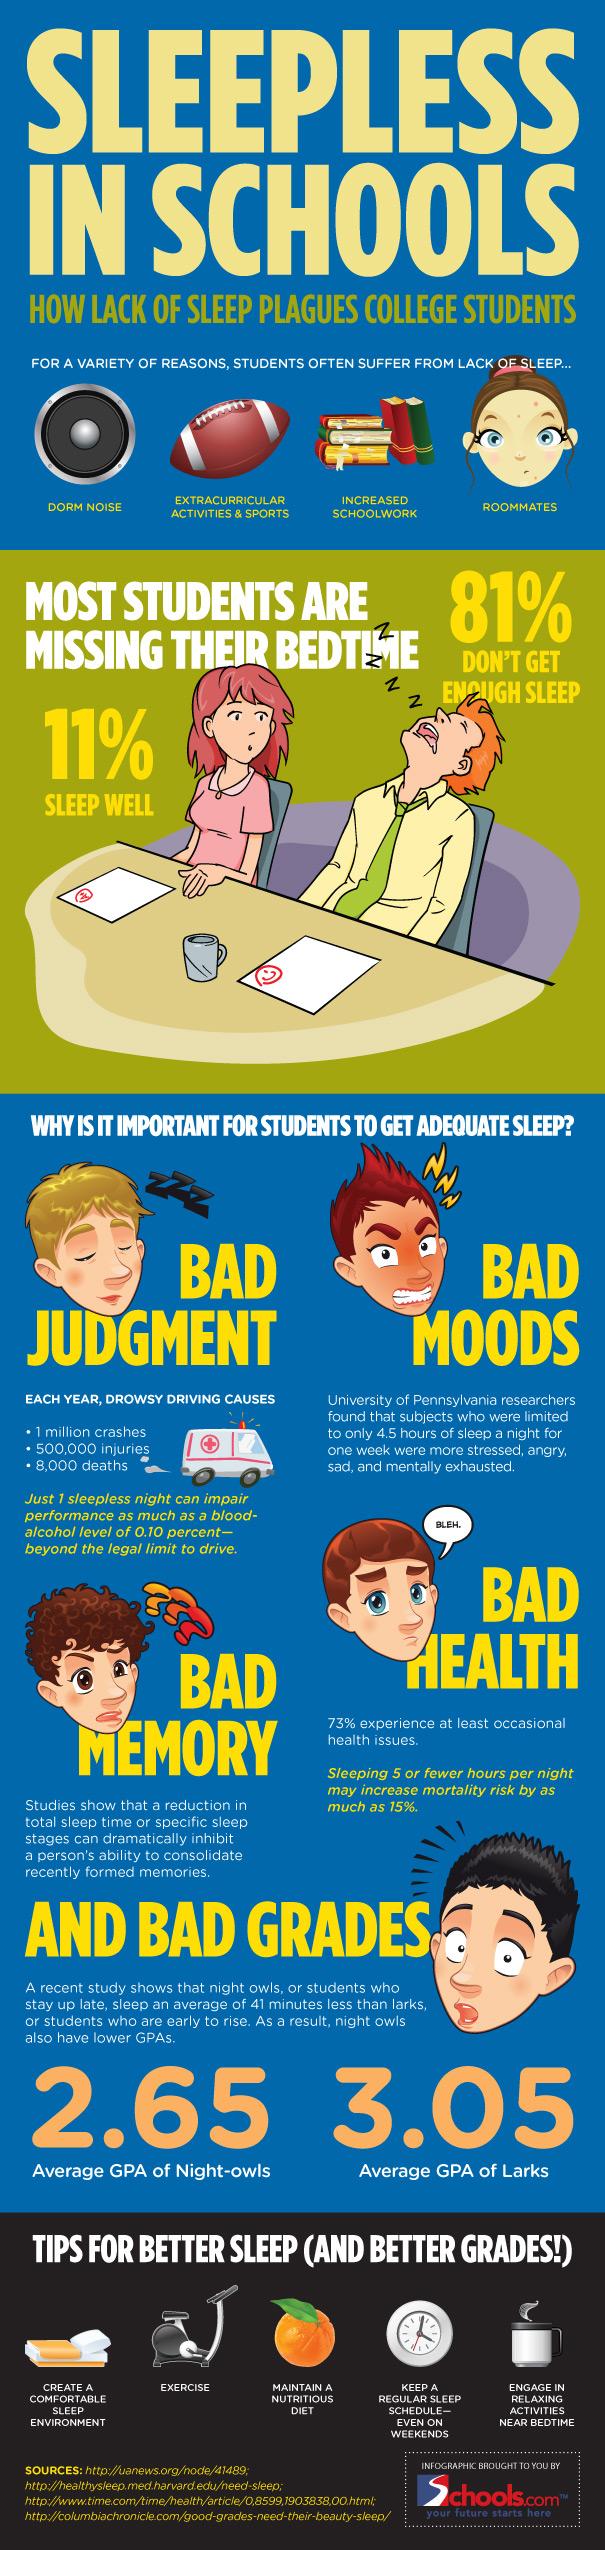 College Students & Sleep